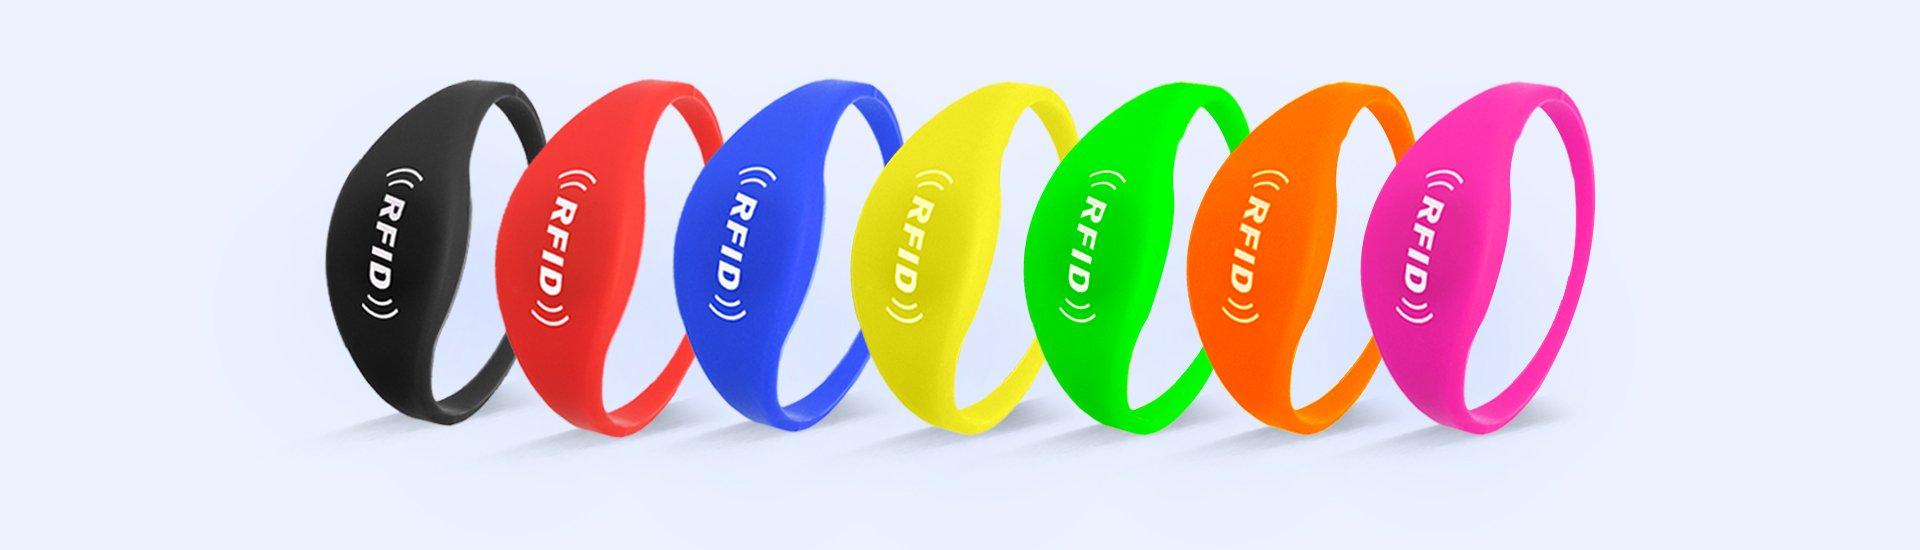 renkli silikon bileklikler